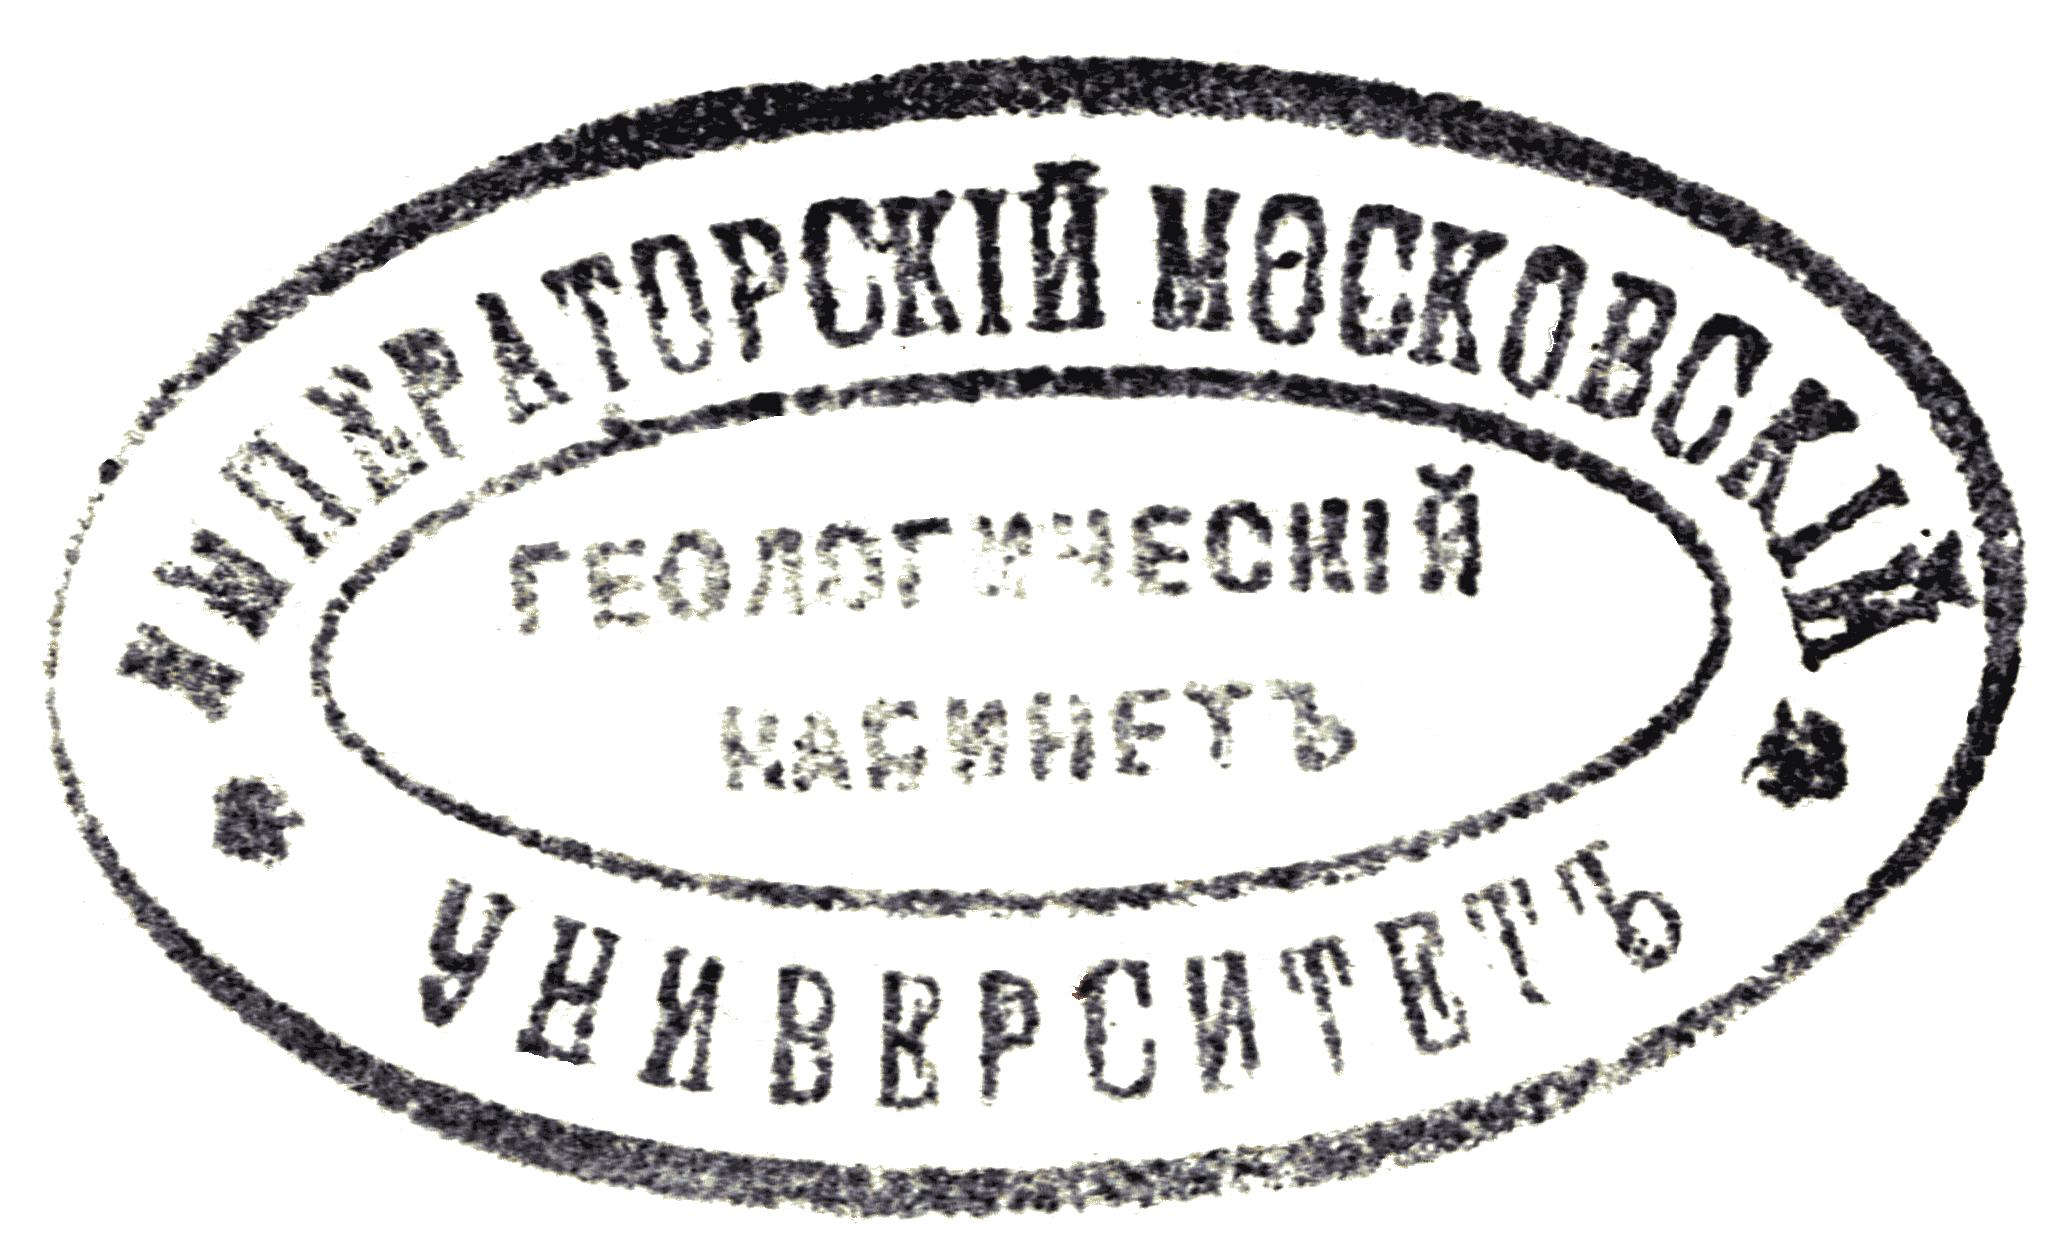 File:Msu-stamp.png - Stamp PNG